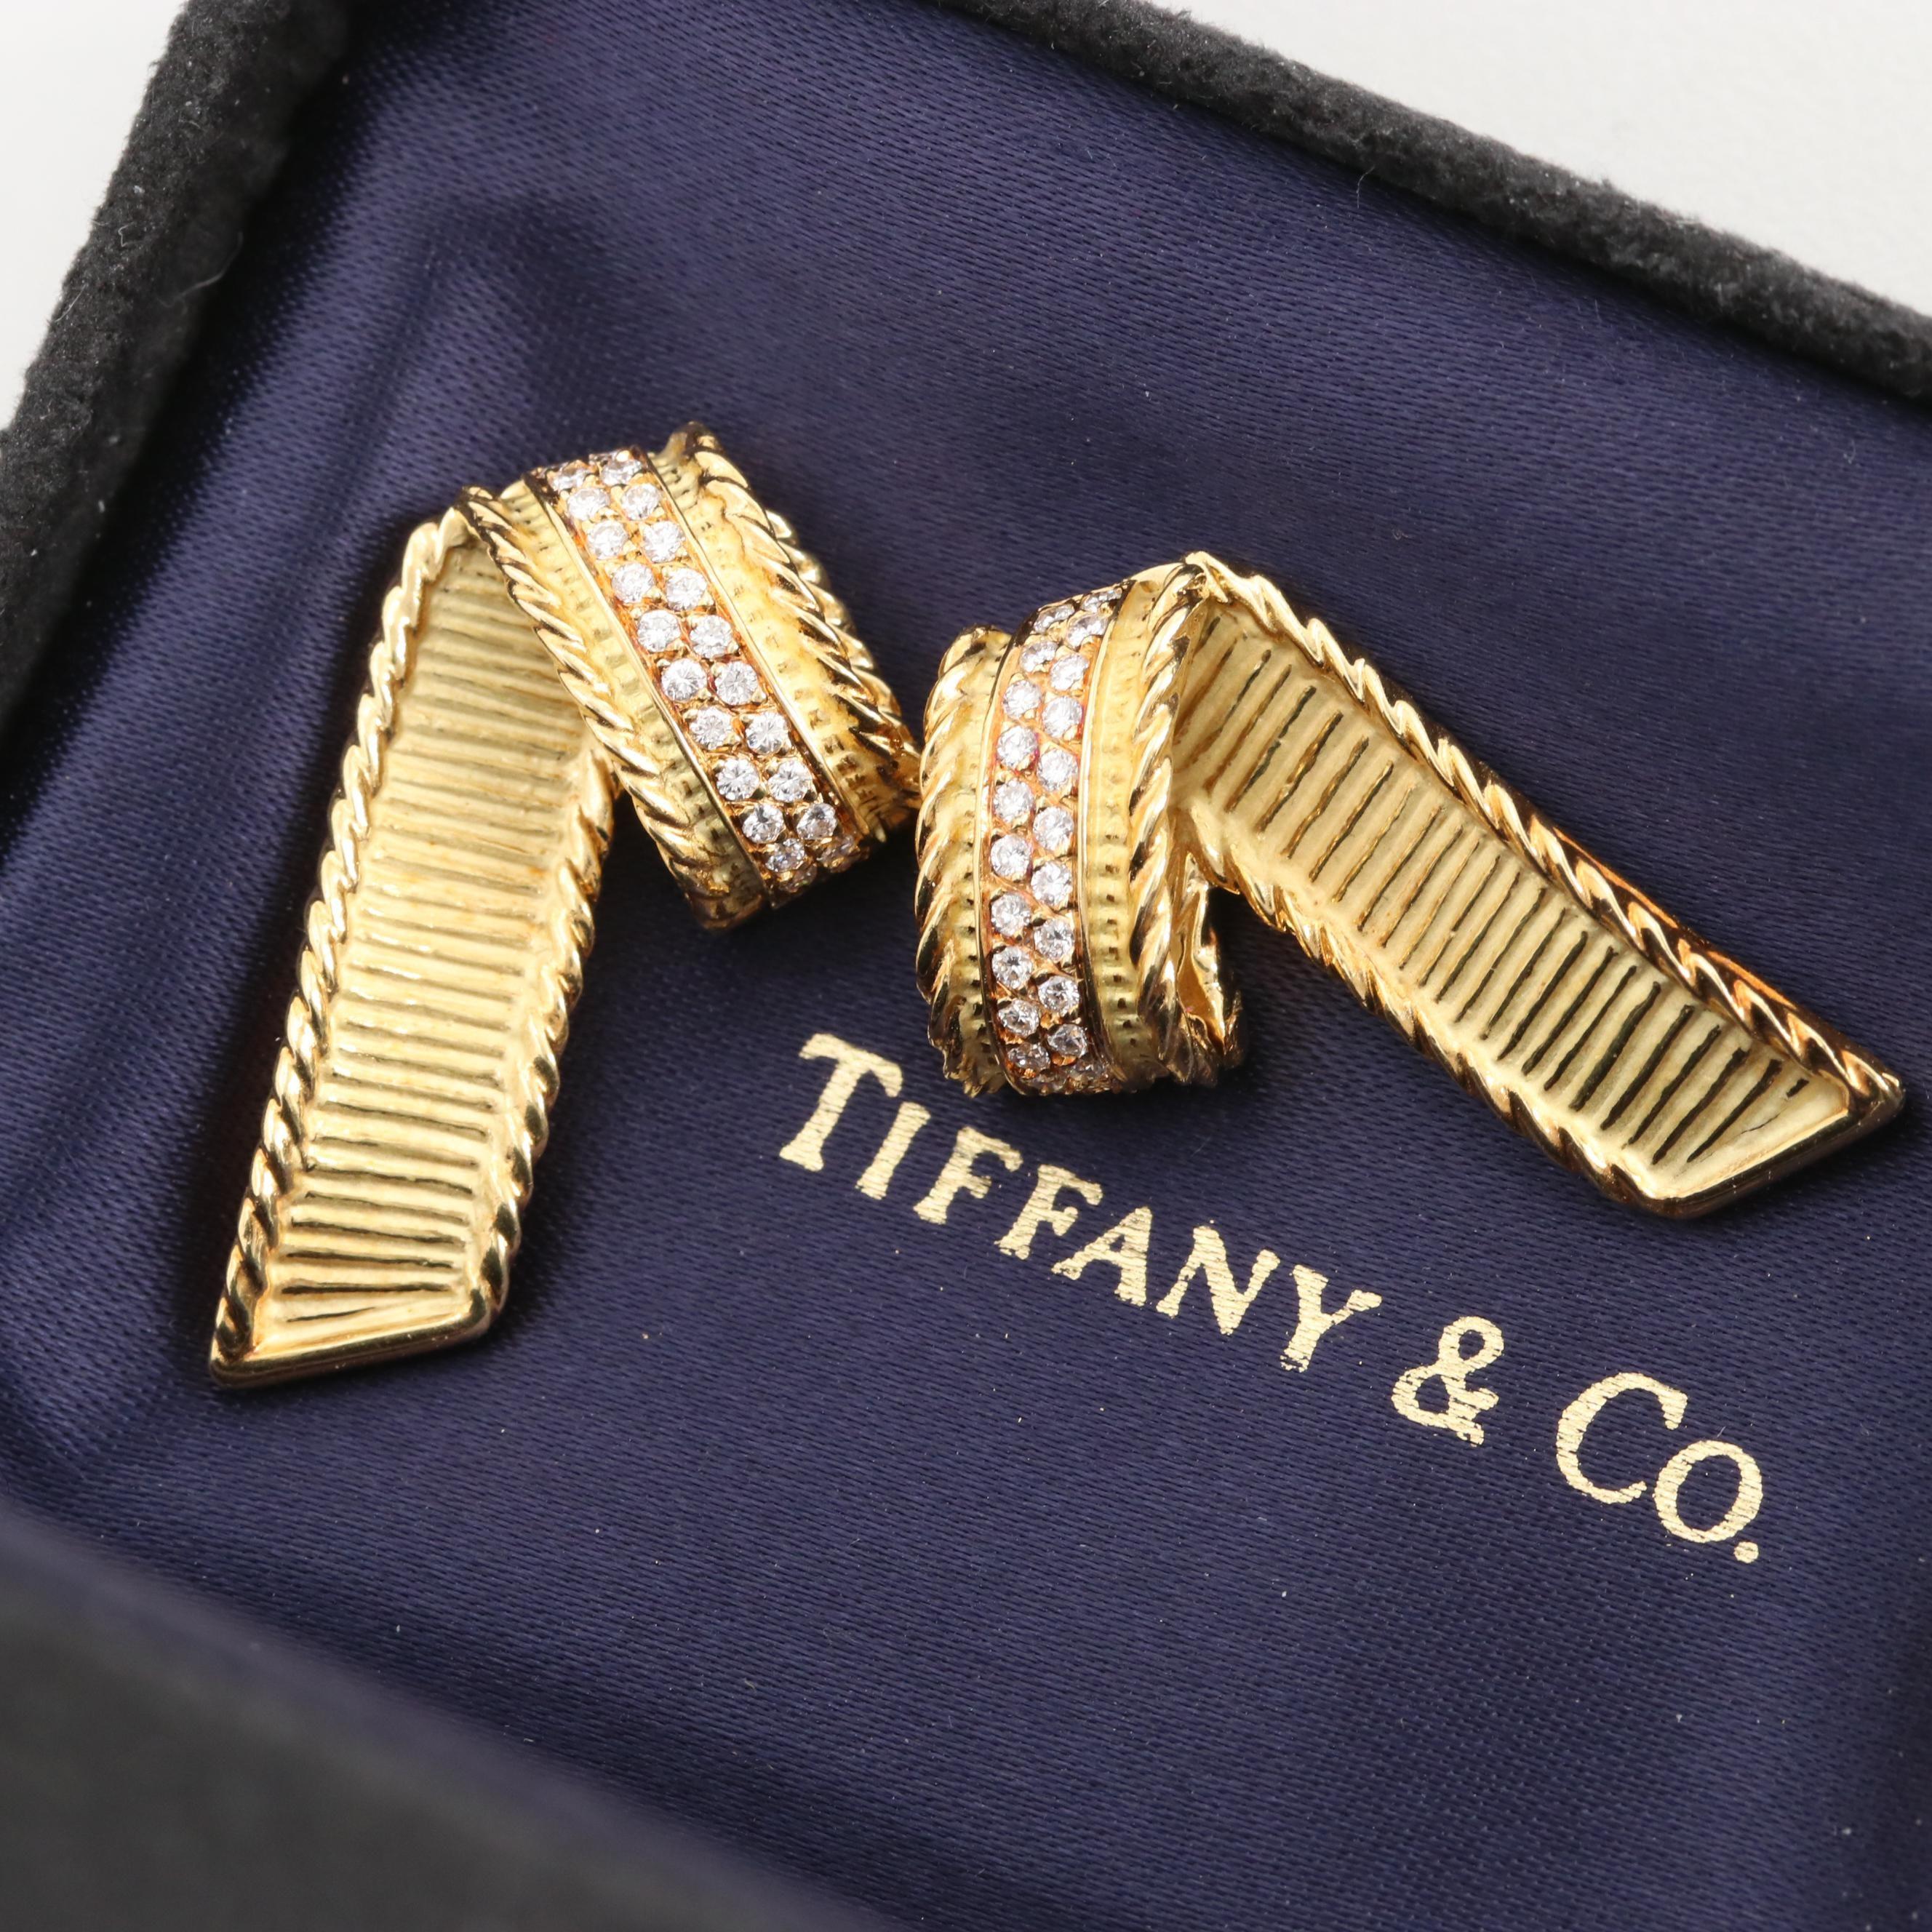 Tiffany & Co. 18K Yellow Gold Diamond Ribbon Earrings